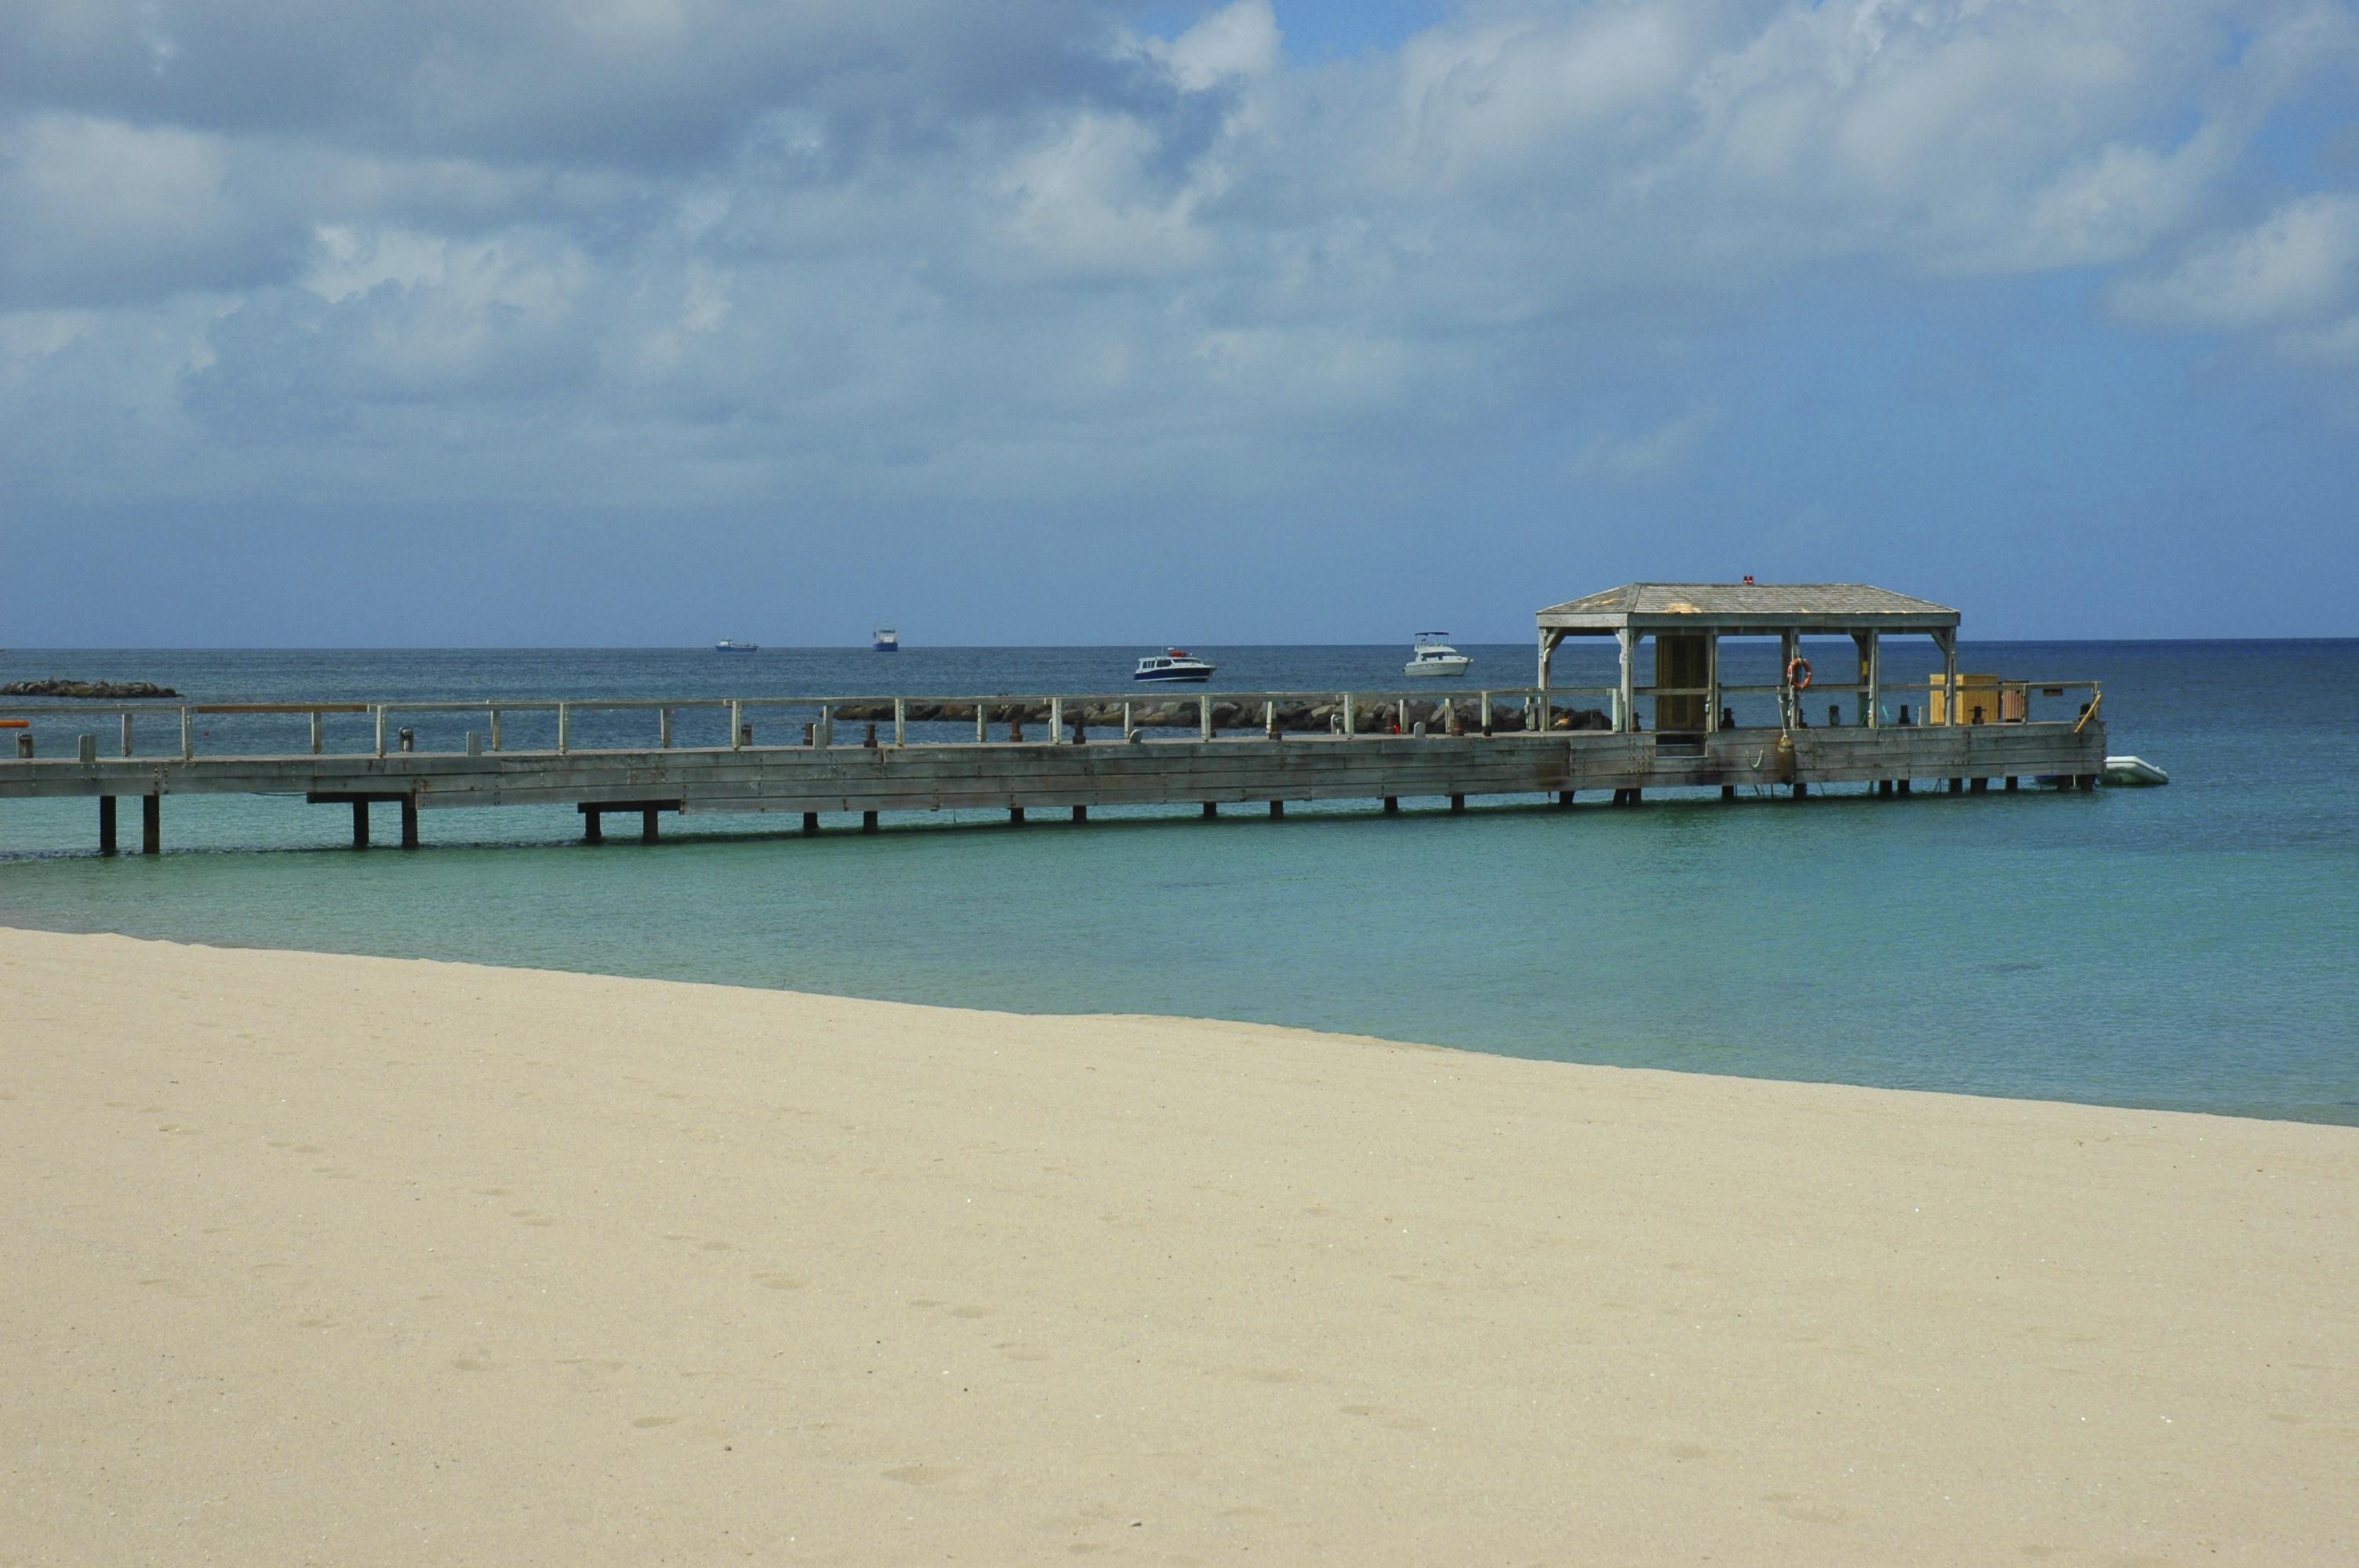 Pier on Nevis Island